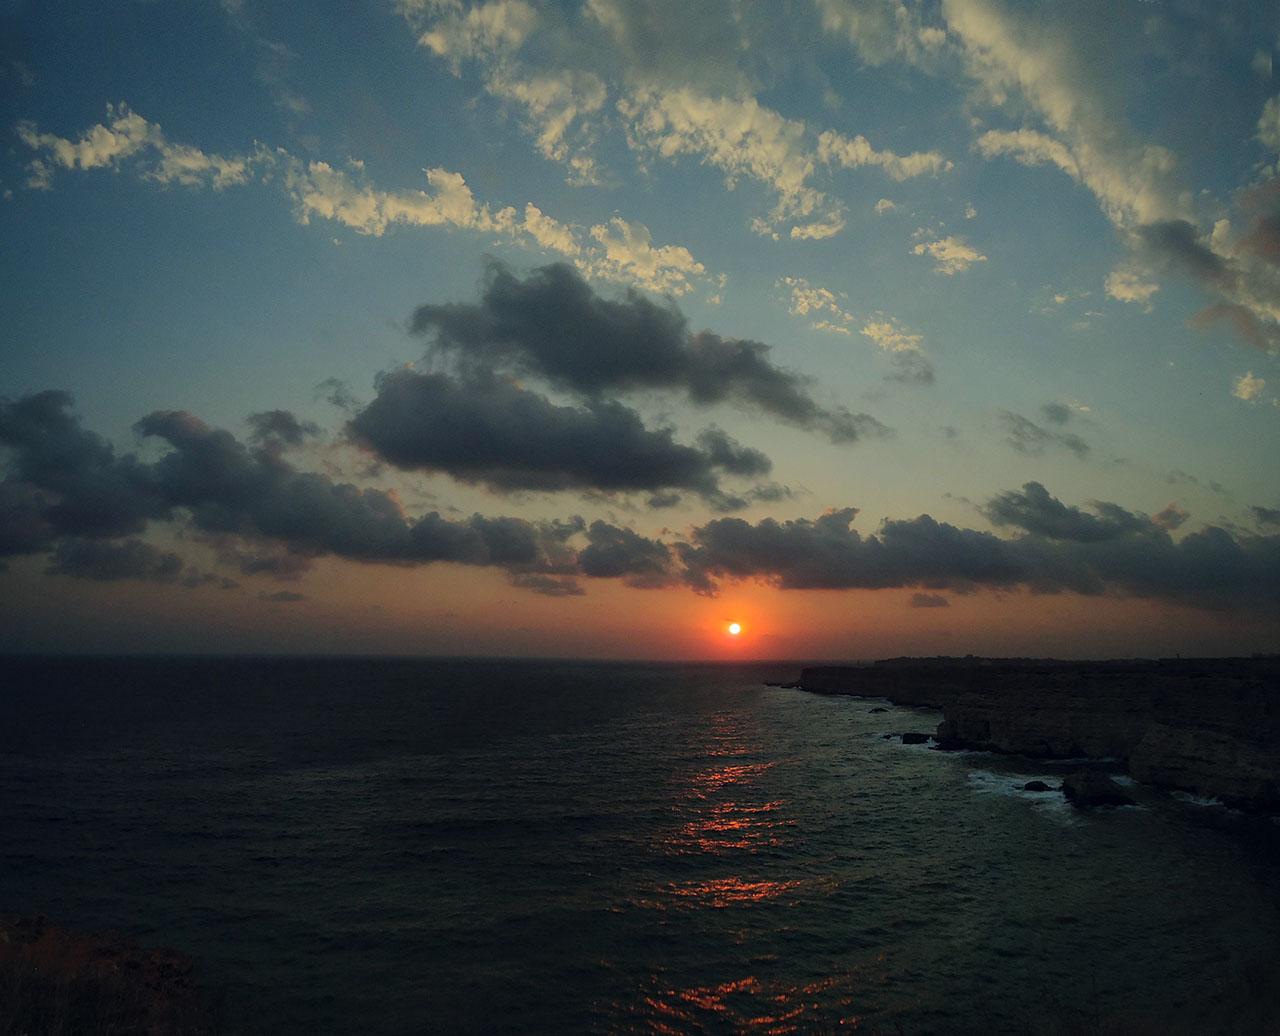 sunset5-1280.jpg